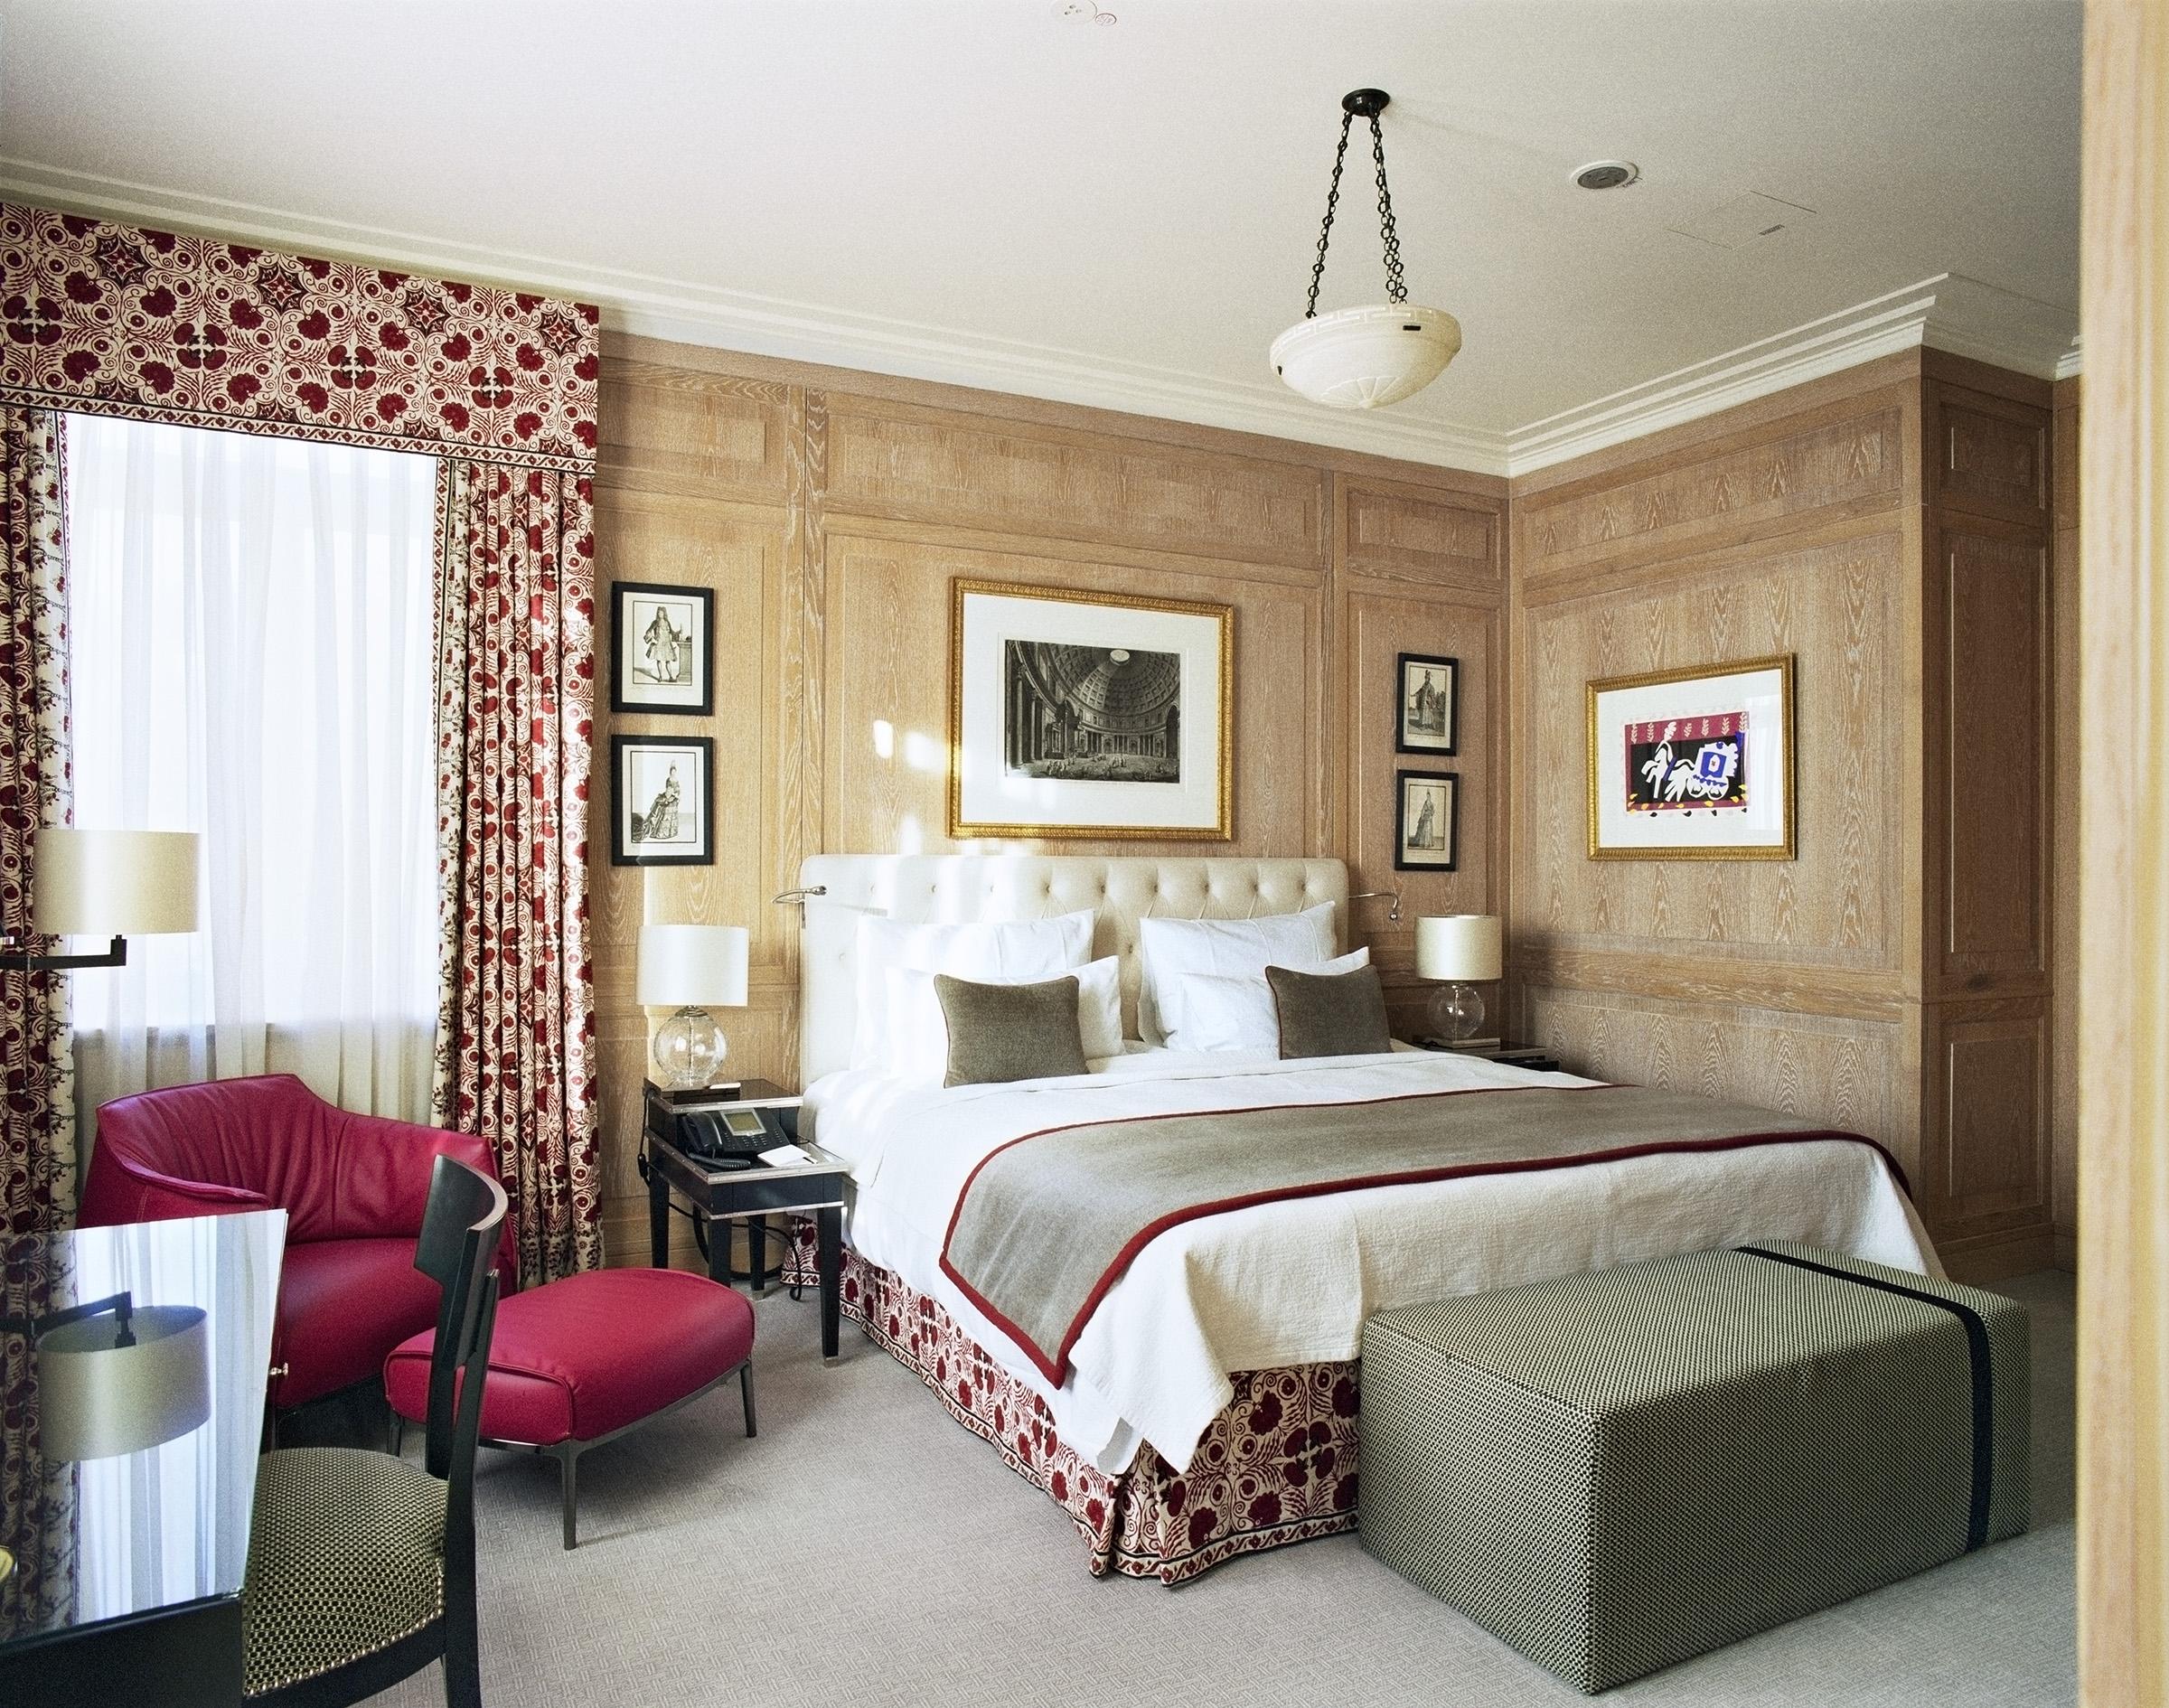 Room_634_1.jpg